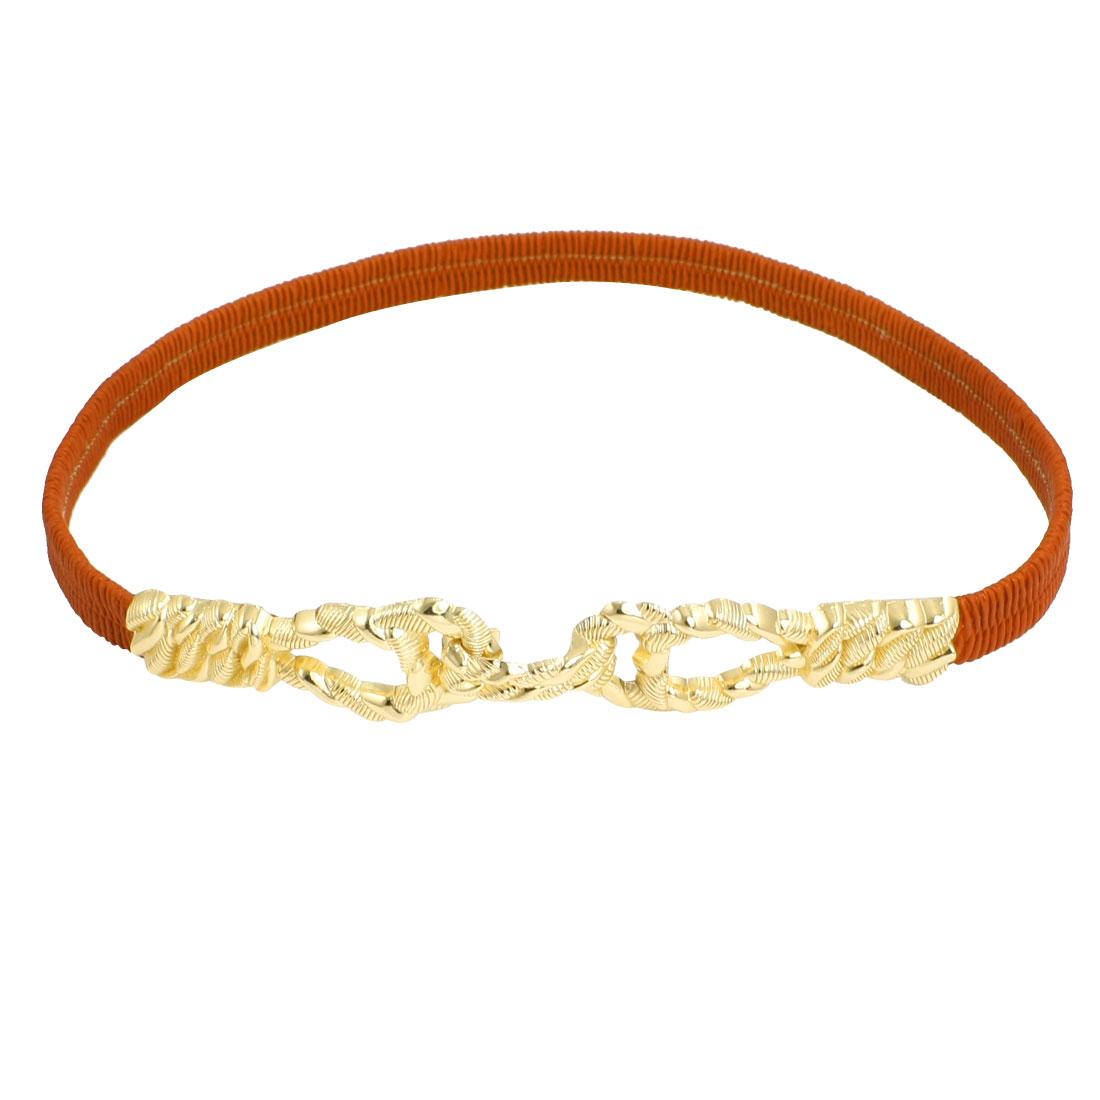 Gold Tone Interlocking Buckle Elastic Band Cinch Belt Orange for Ladies